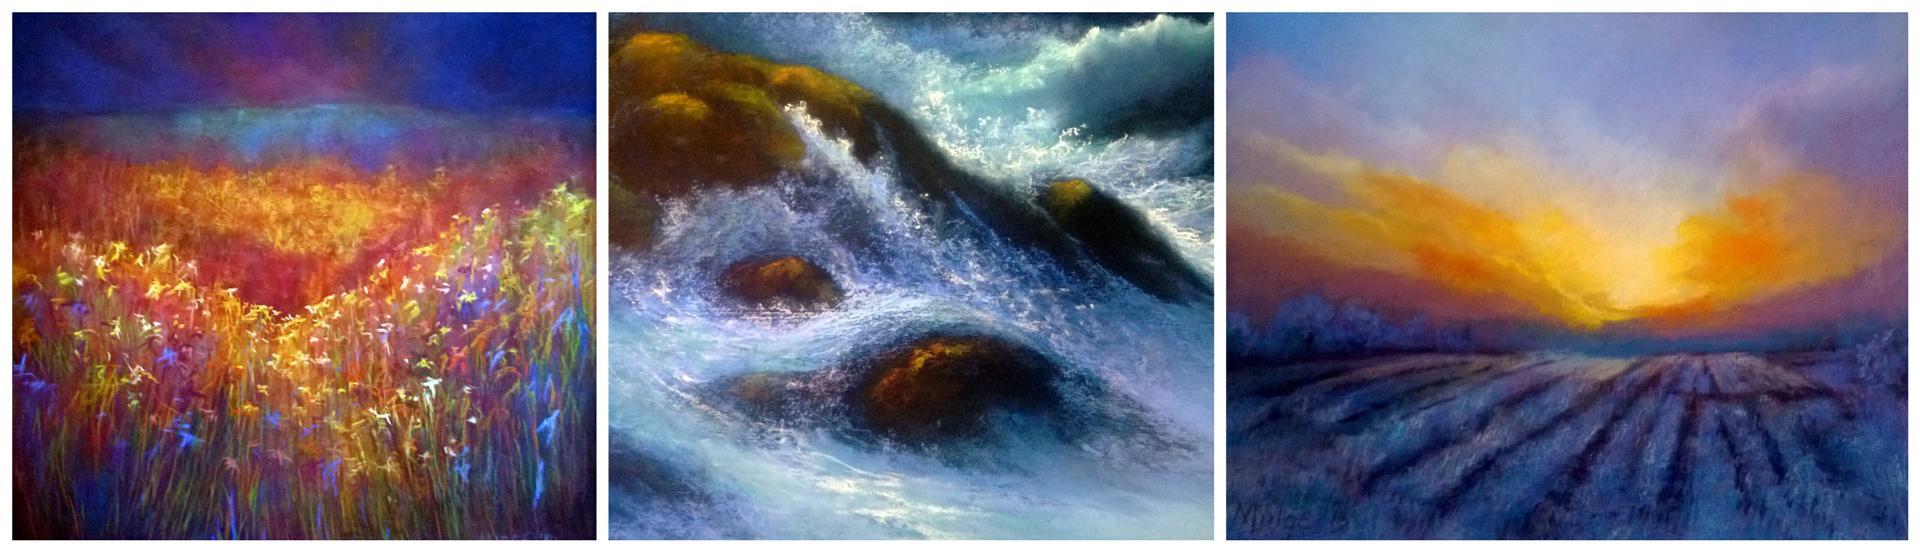 Artworks in Pastel, Acrylics & Oil